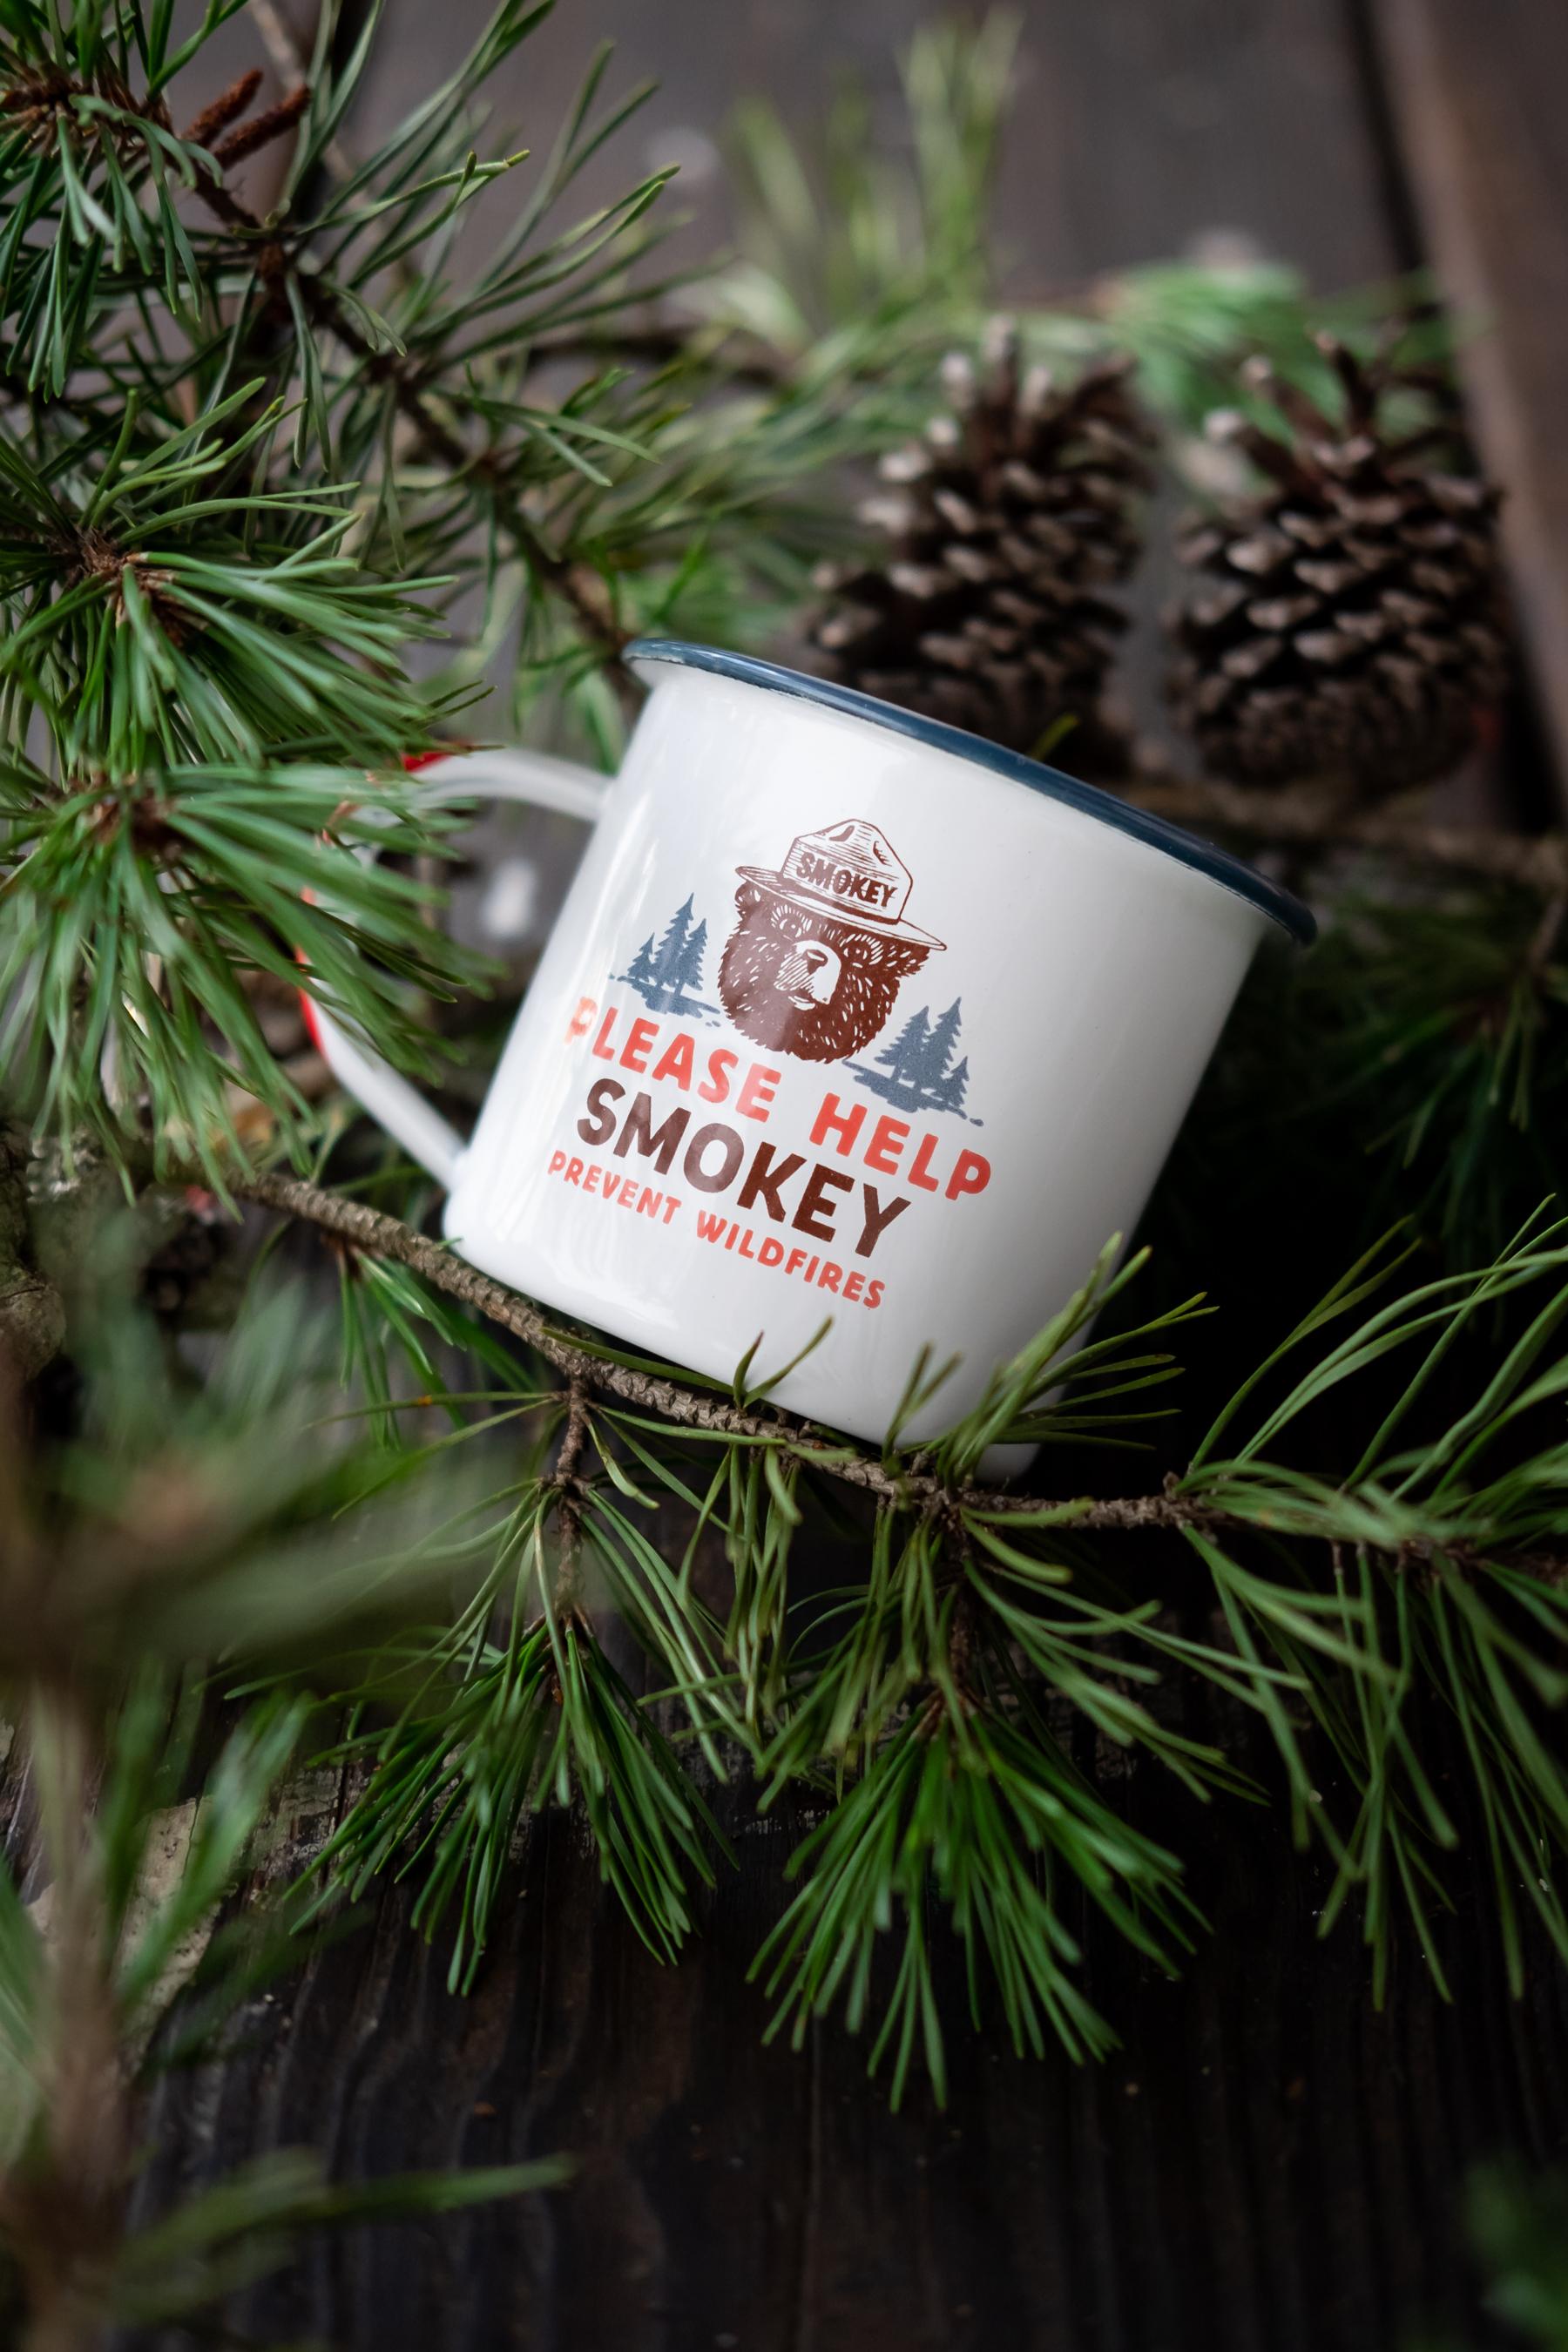 smokey-bear-enamel-mug-01.jpg